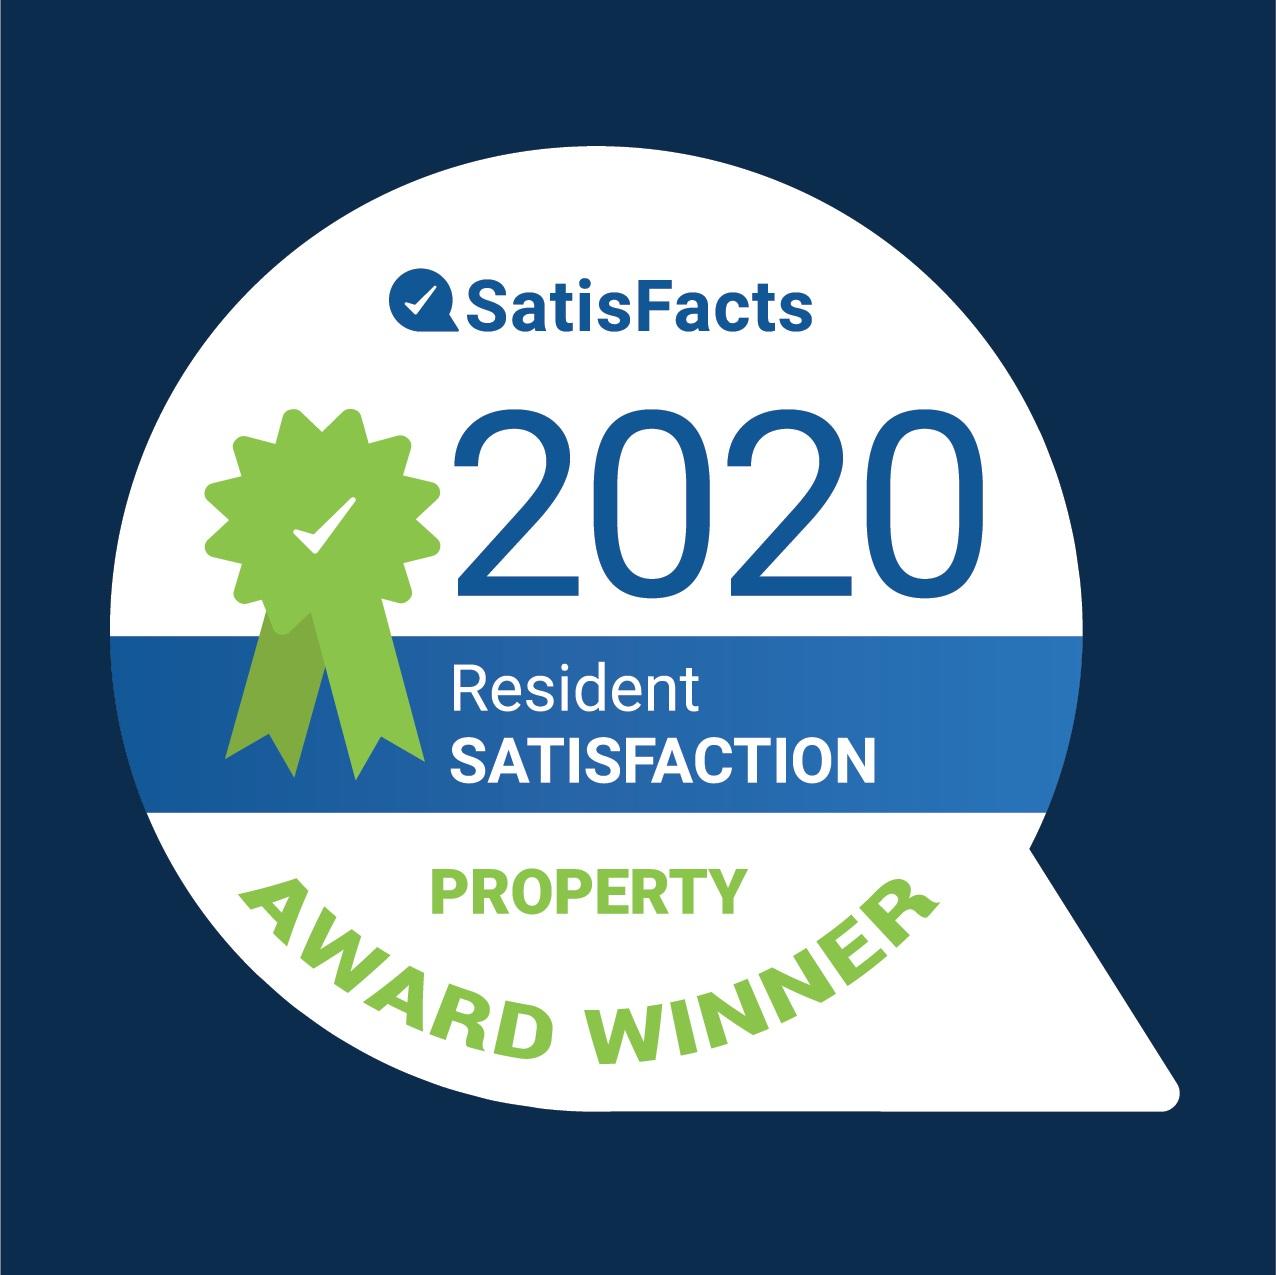 2020 SatisFacts Resident Satisfaction Property Award Winner